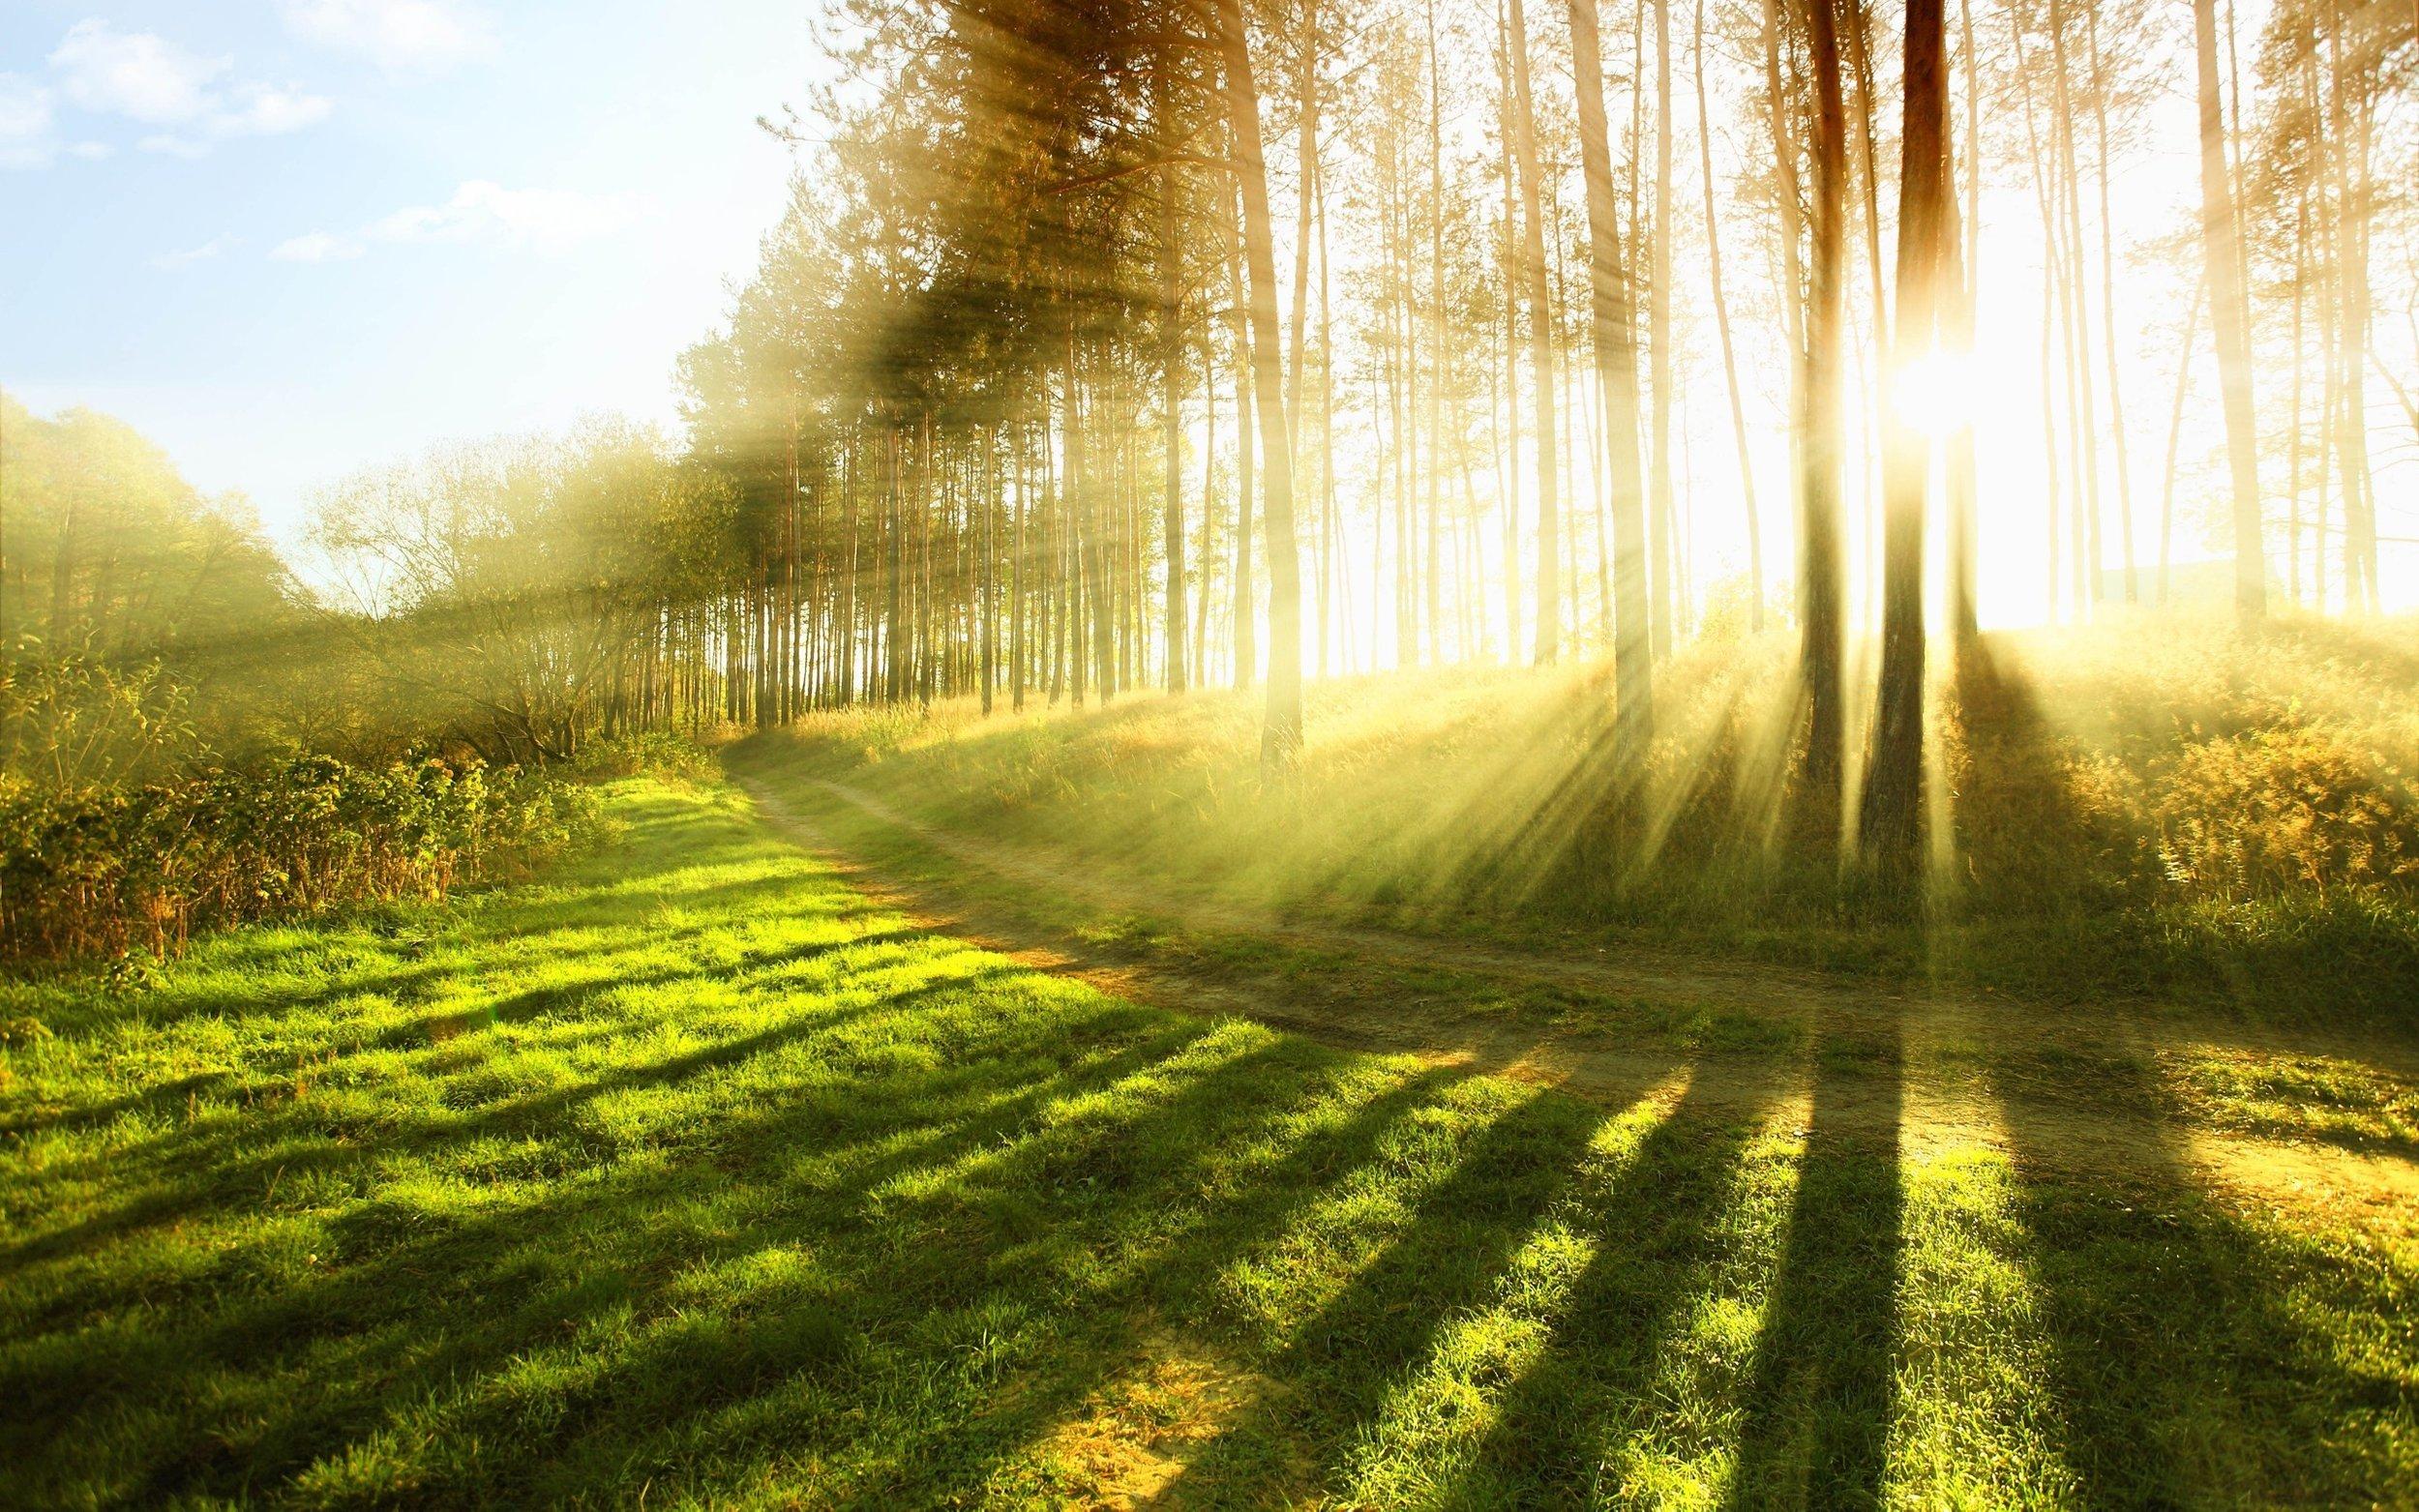 Sun Shining Through The Trees Religious Stock Photo.jpg